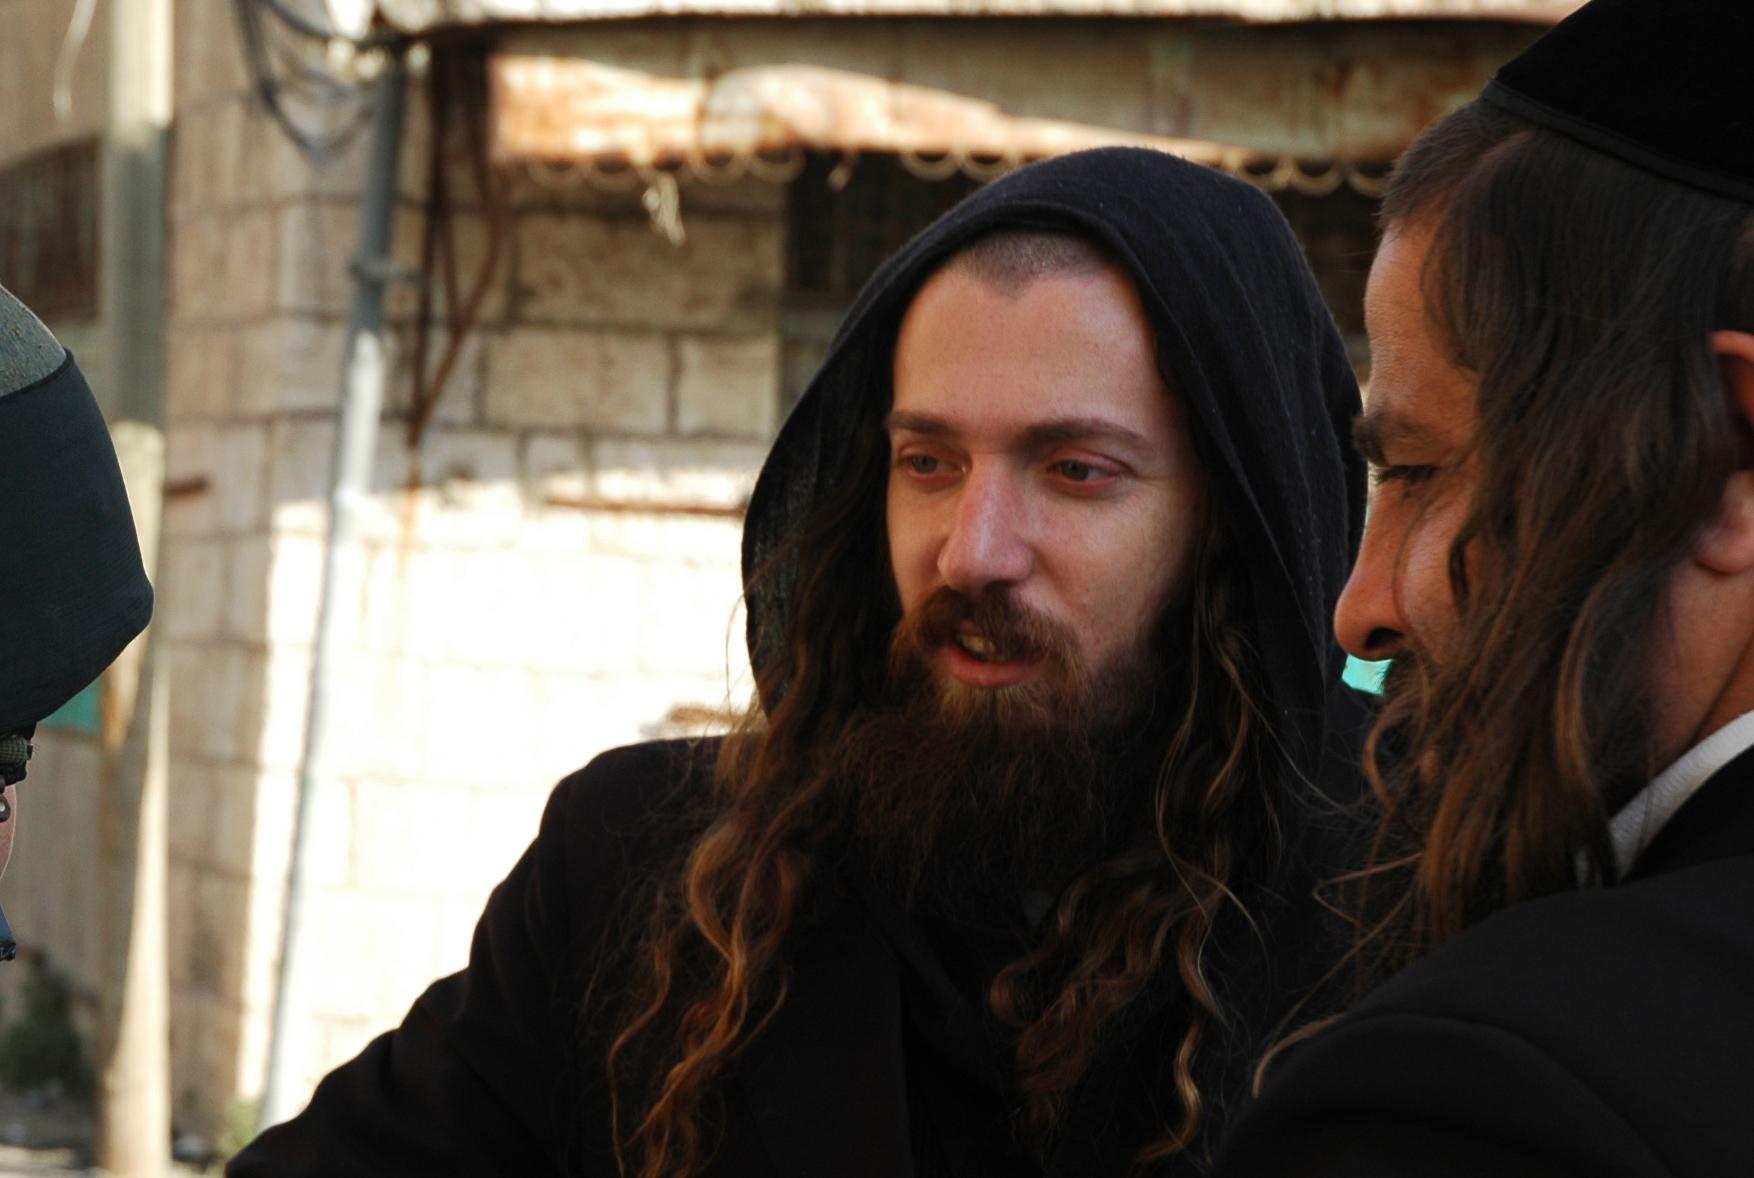 prodlouzeny vikend v izraeli